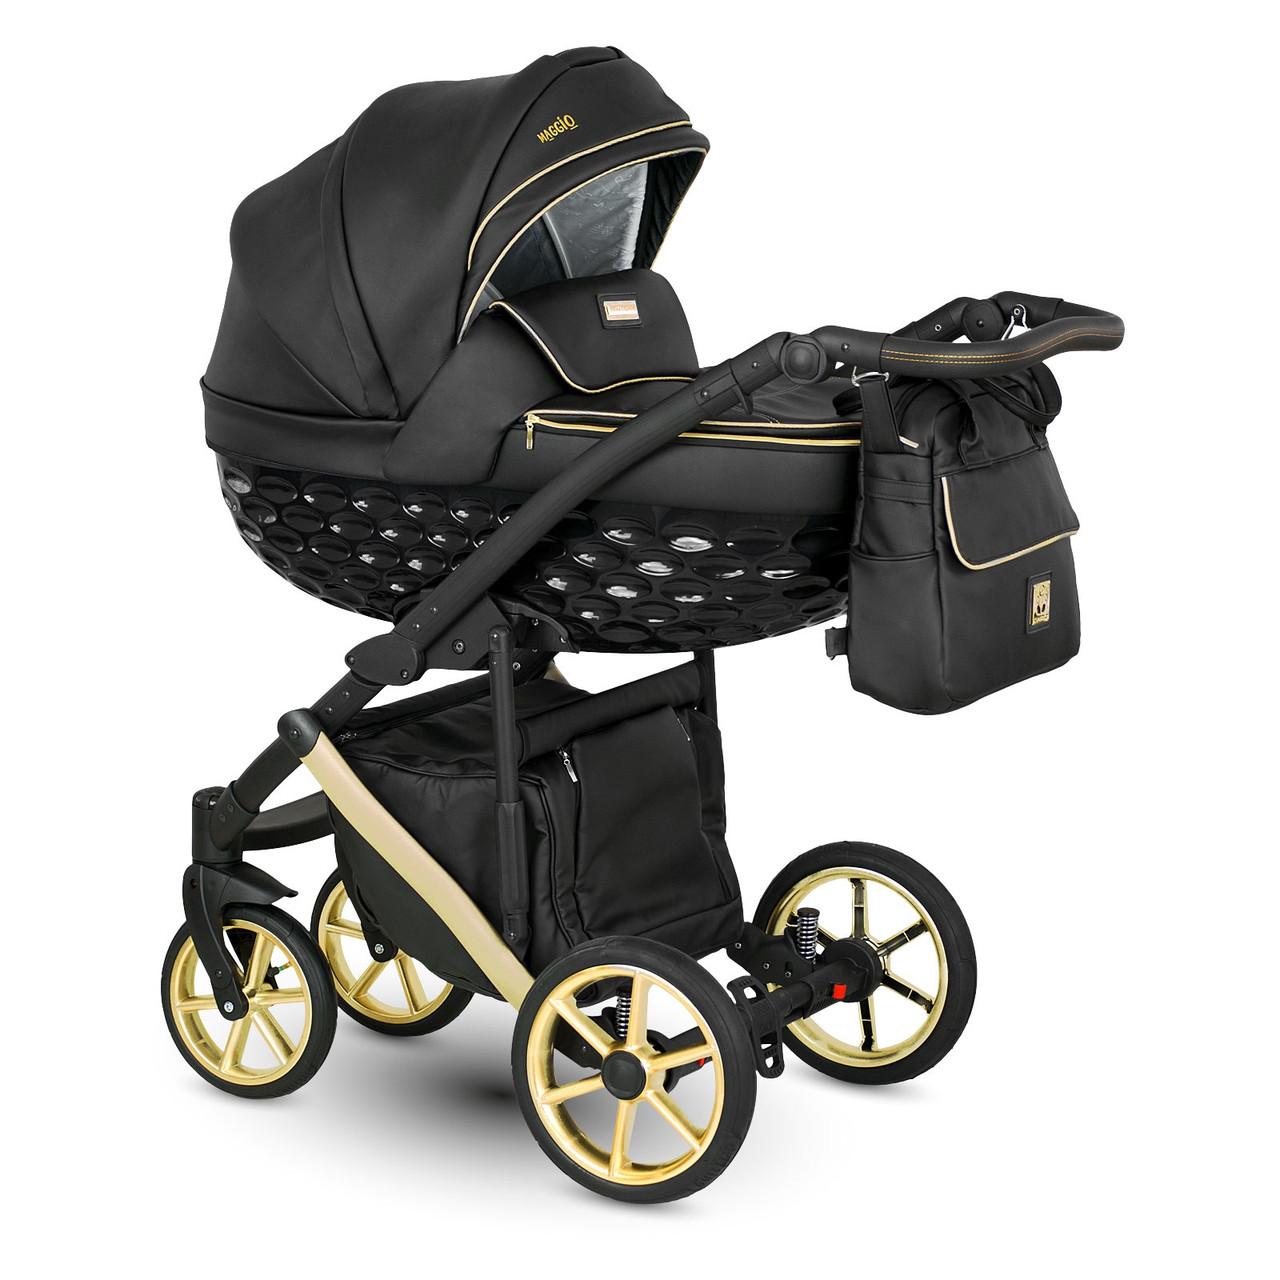 Дитяча універсальна коляска 2 в 1 Camarelo Maggio MgEco-01